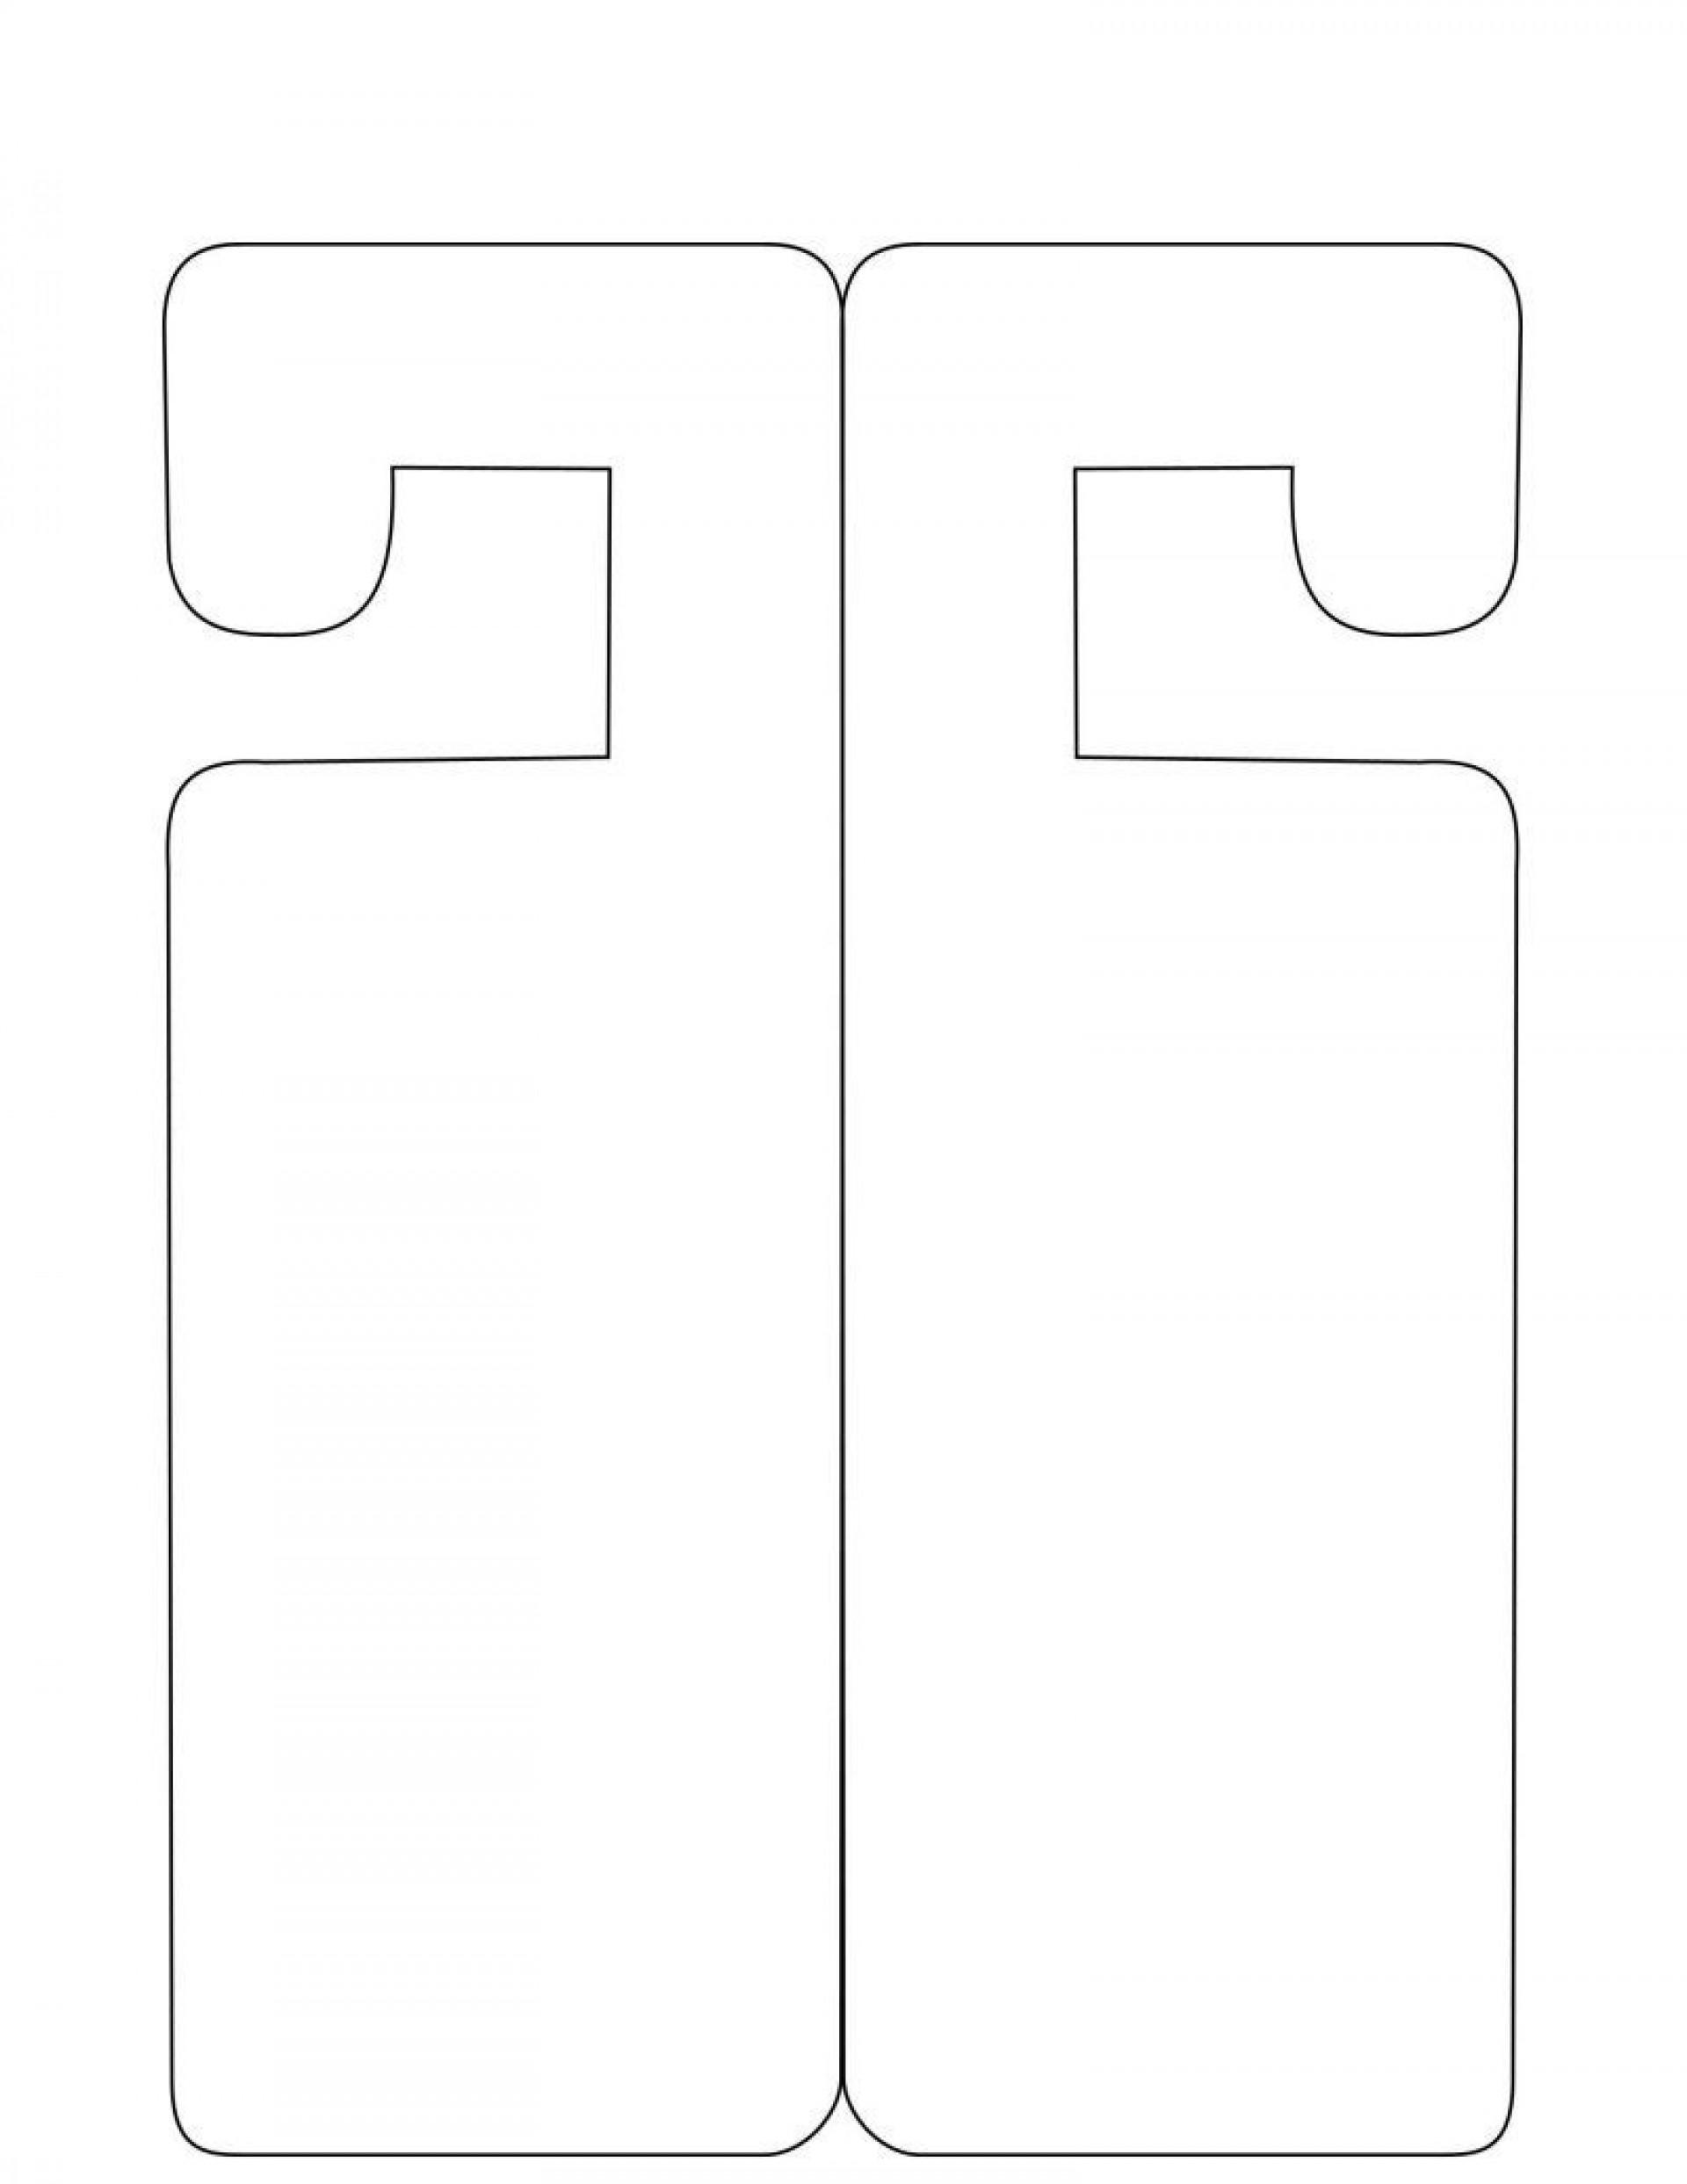 001 Incredible Door Hanger Template For Word Inspiration  Download Free Wedding Microsoft1920